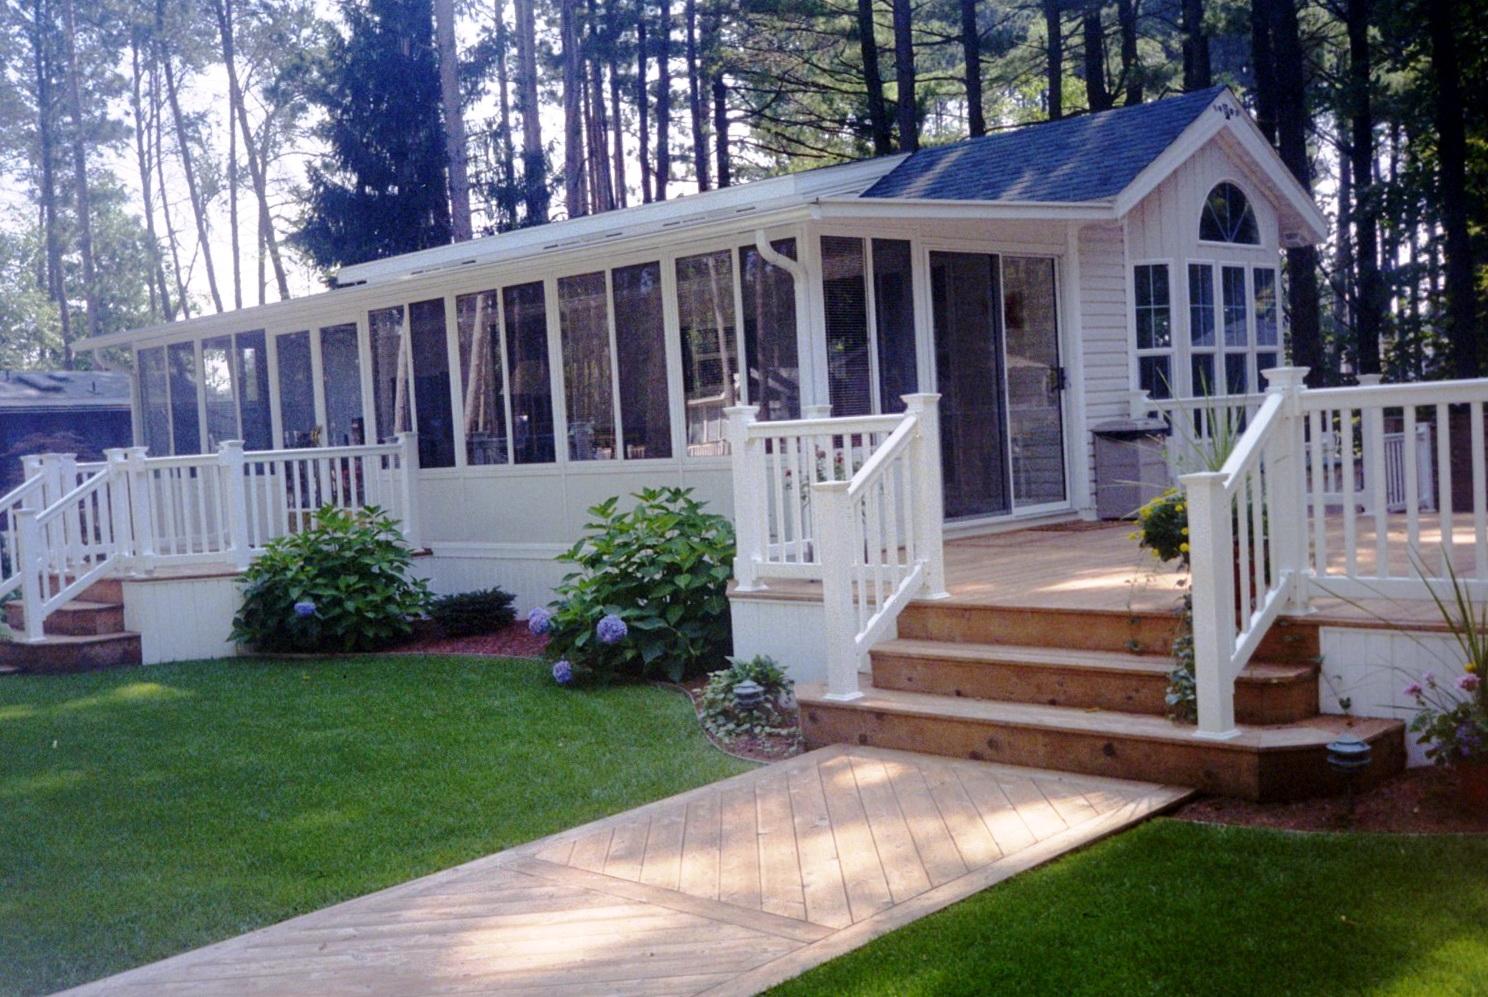 Front porch decks for mobile homes home design ideas for Porch and deck designs for mobile homes